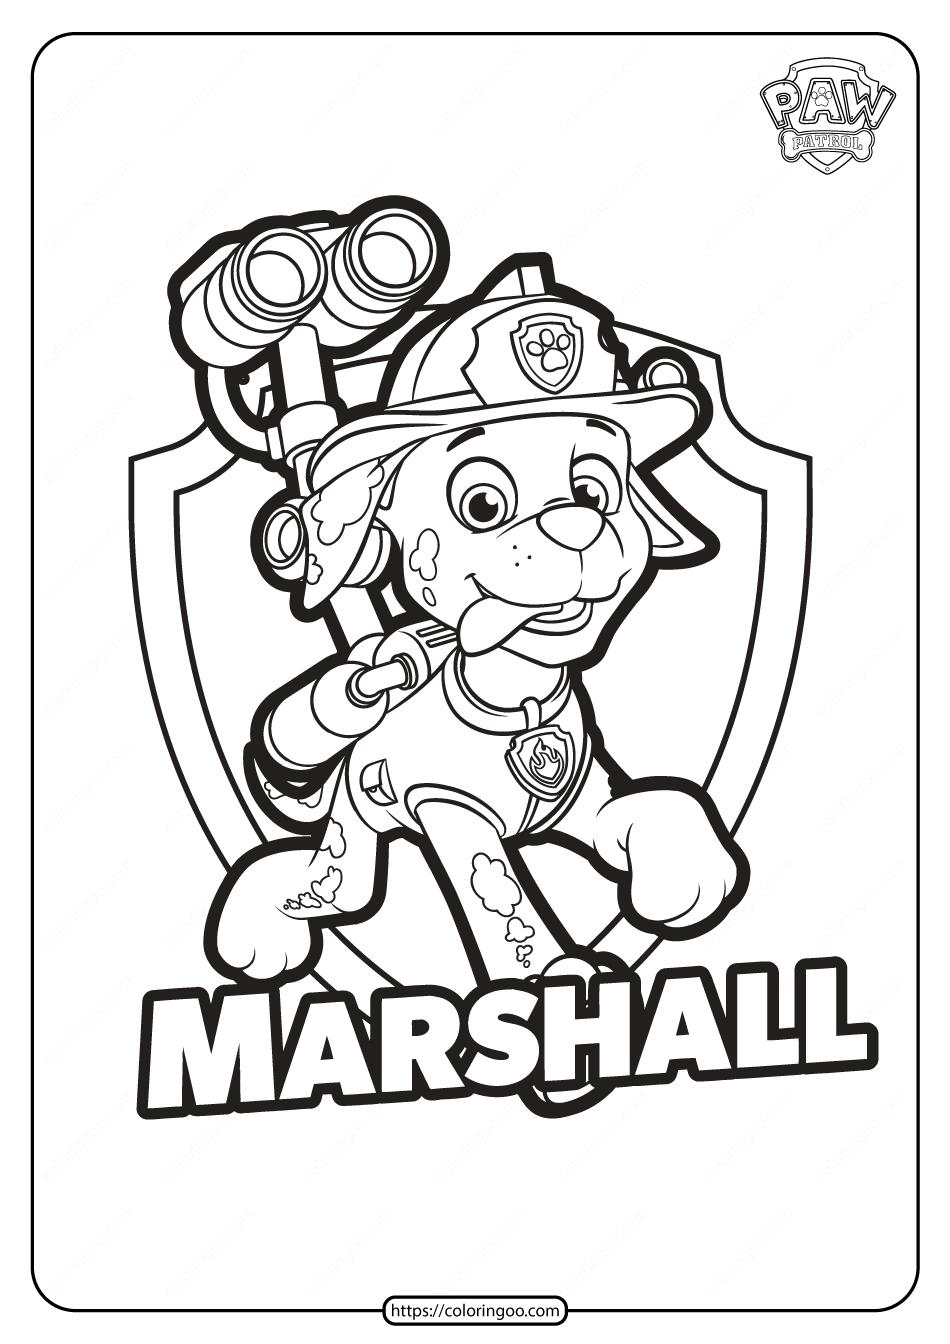 Free Printable Paw Patrol Marshall Coloring Pages 1 In 2021 Paw Patrol Coloring Pages Paw Patrol Coloring Marshall Paw Patrol [ 1344 x 950 Pixel ]